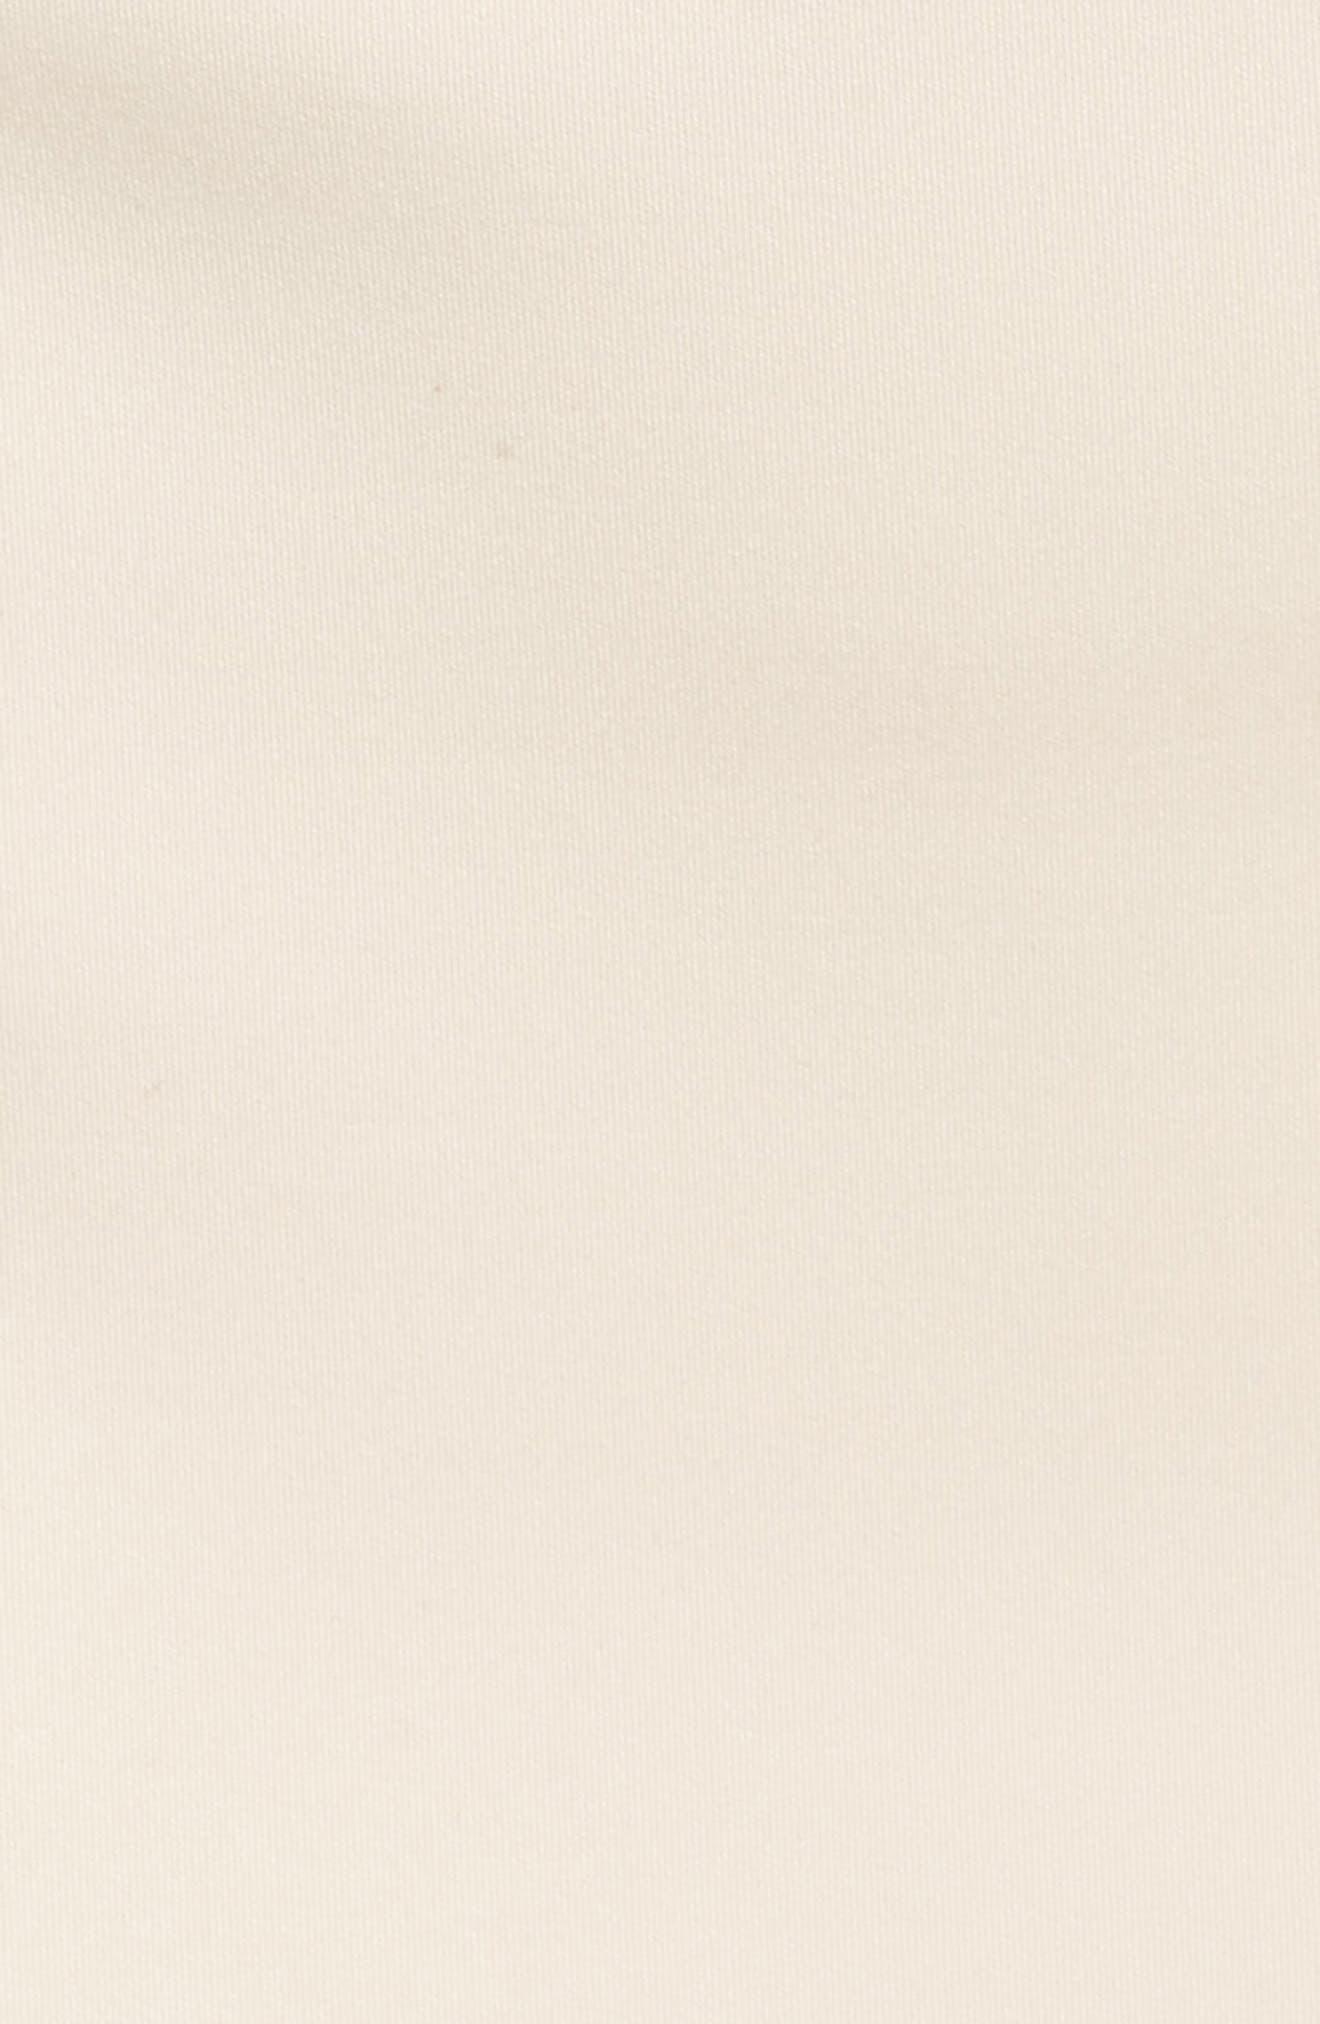 Sequin Appliqué Neoprene Sheath Dress,                             Alternate thumbnail 6, color,                             250